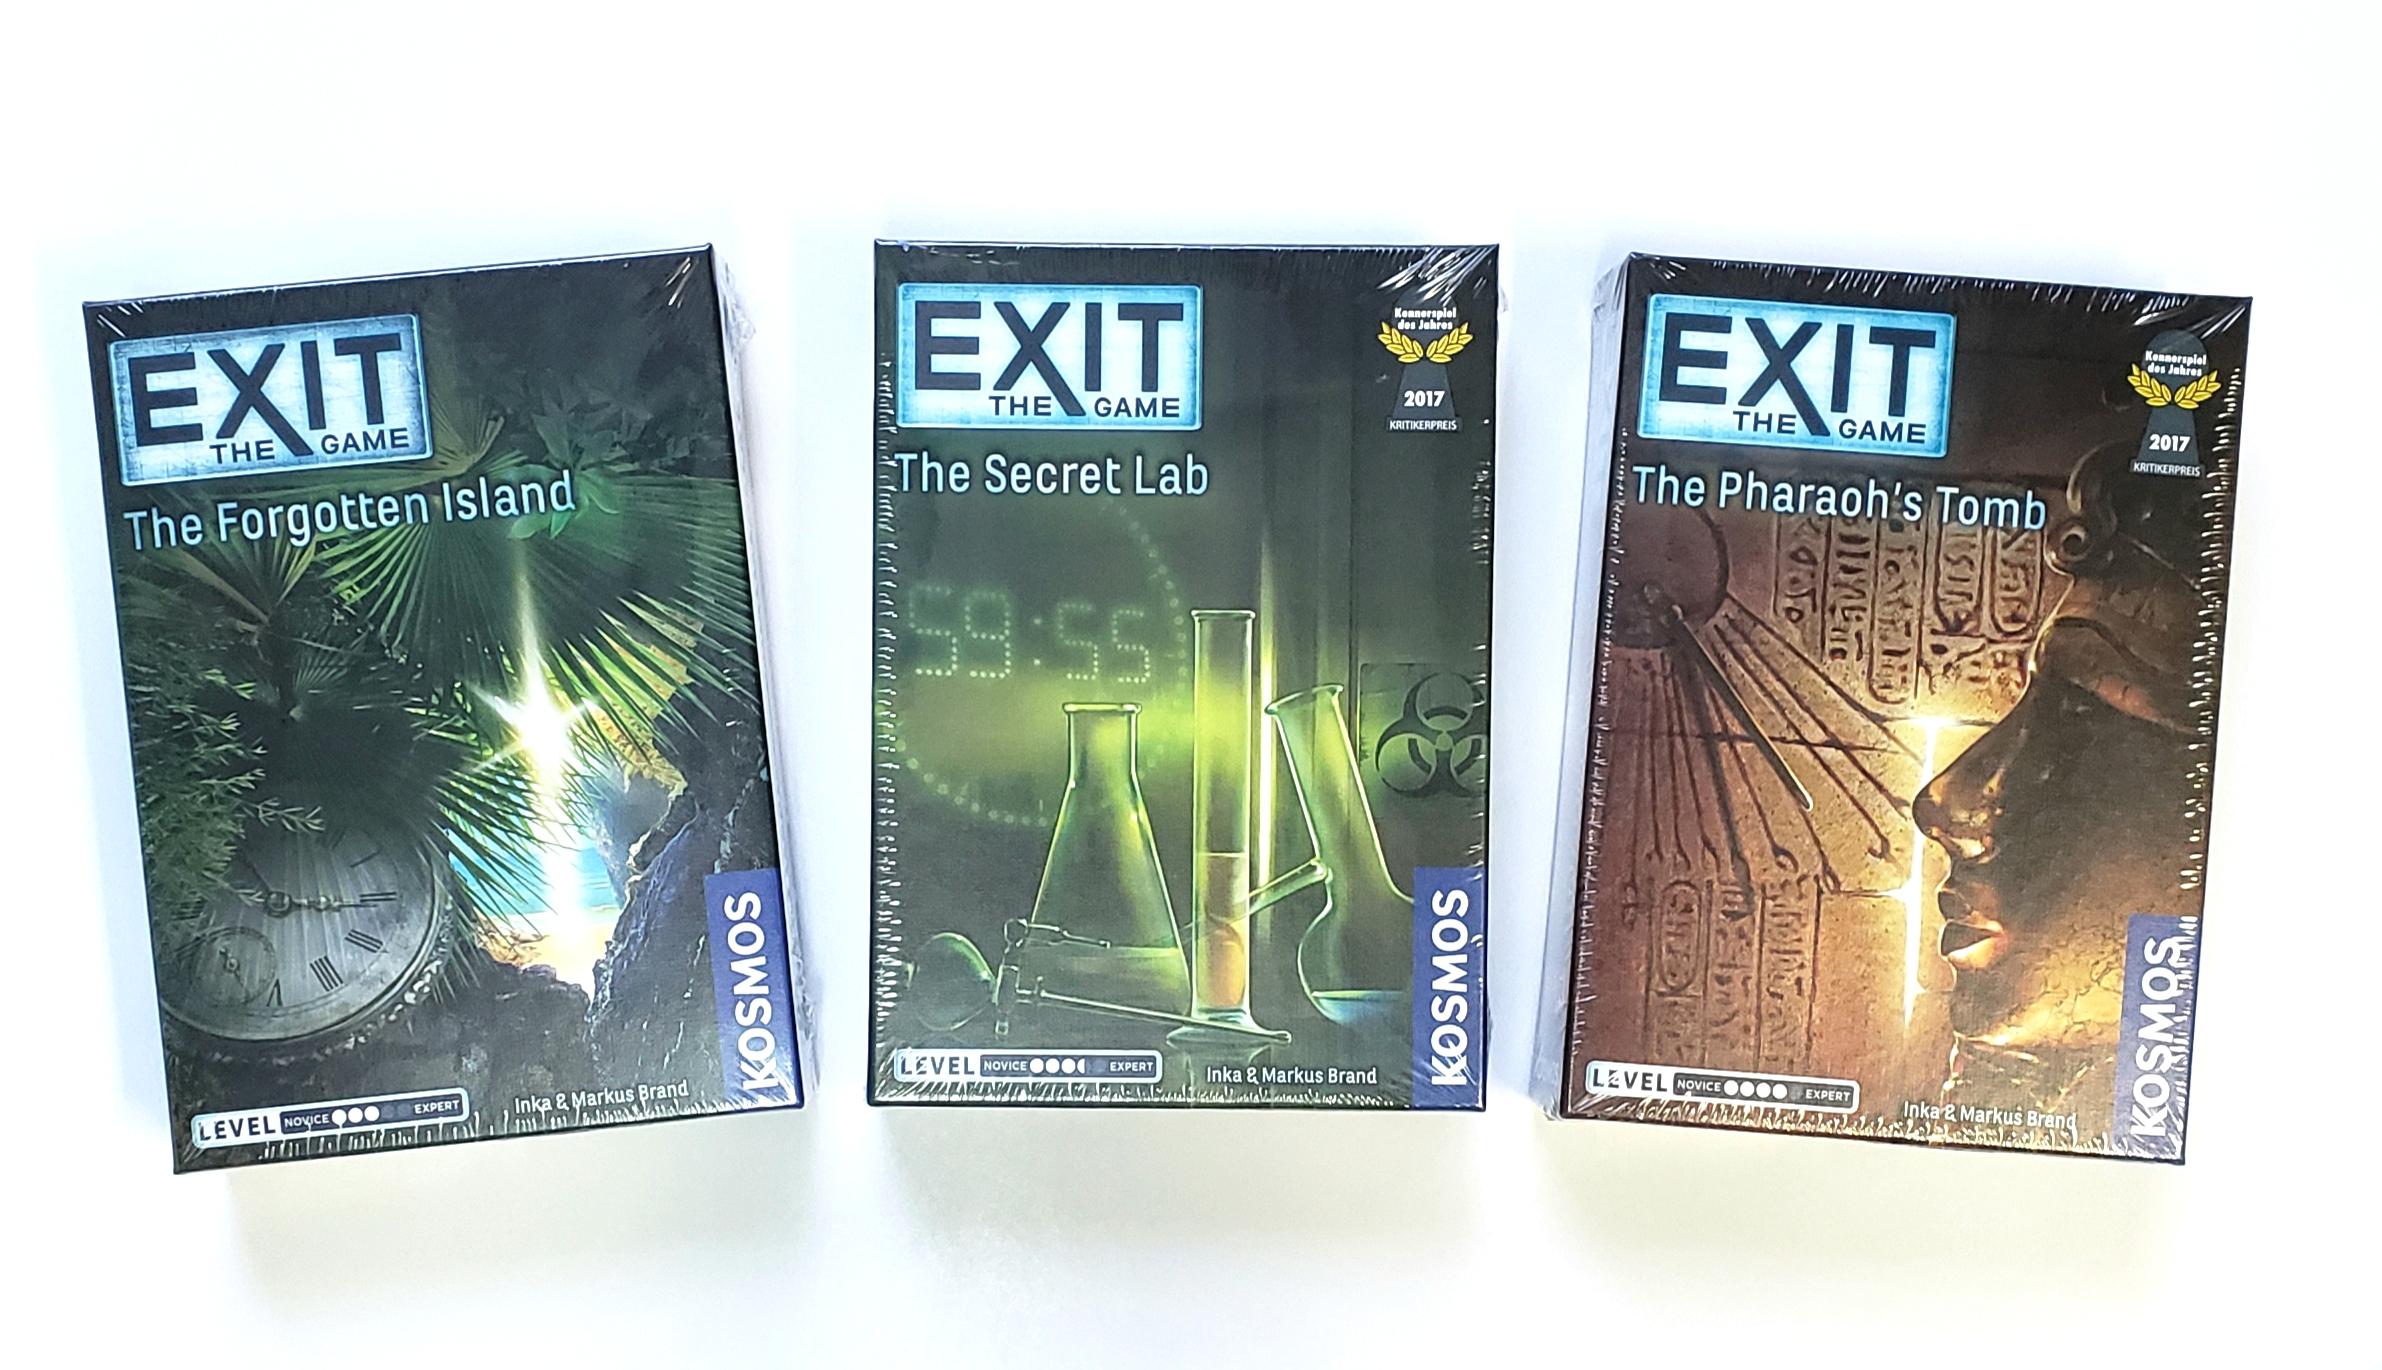 EXIT Game Series